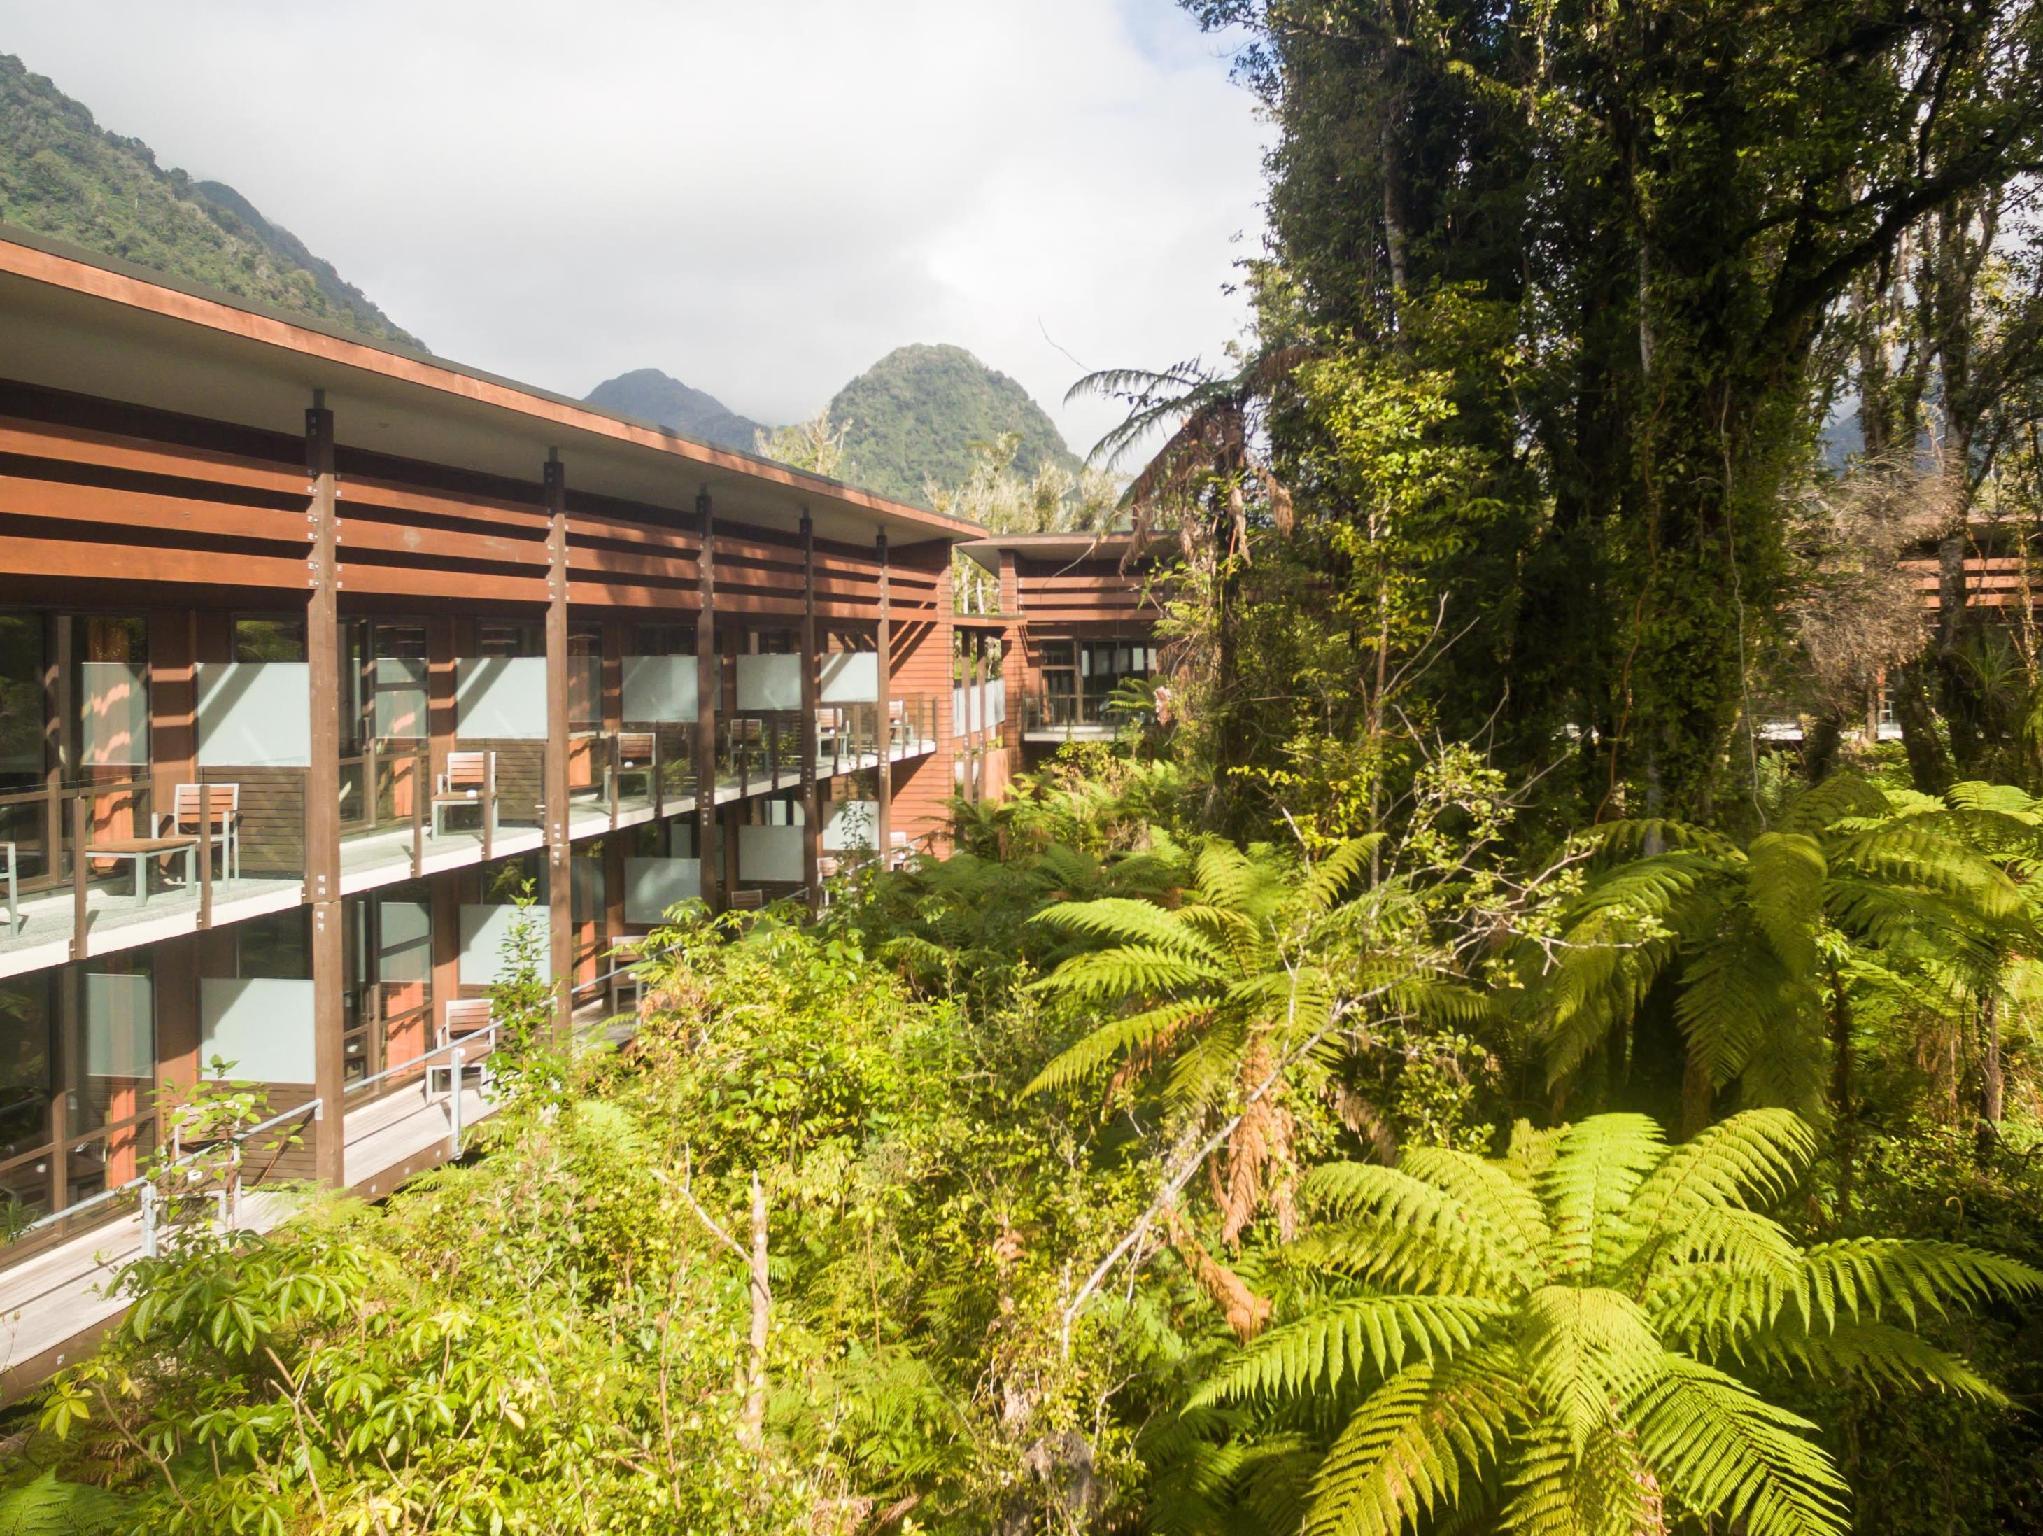 Te Waonui Forest Retreat Te Waonui Forest